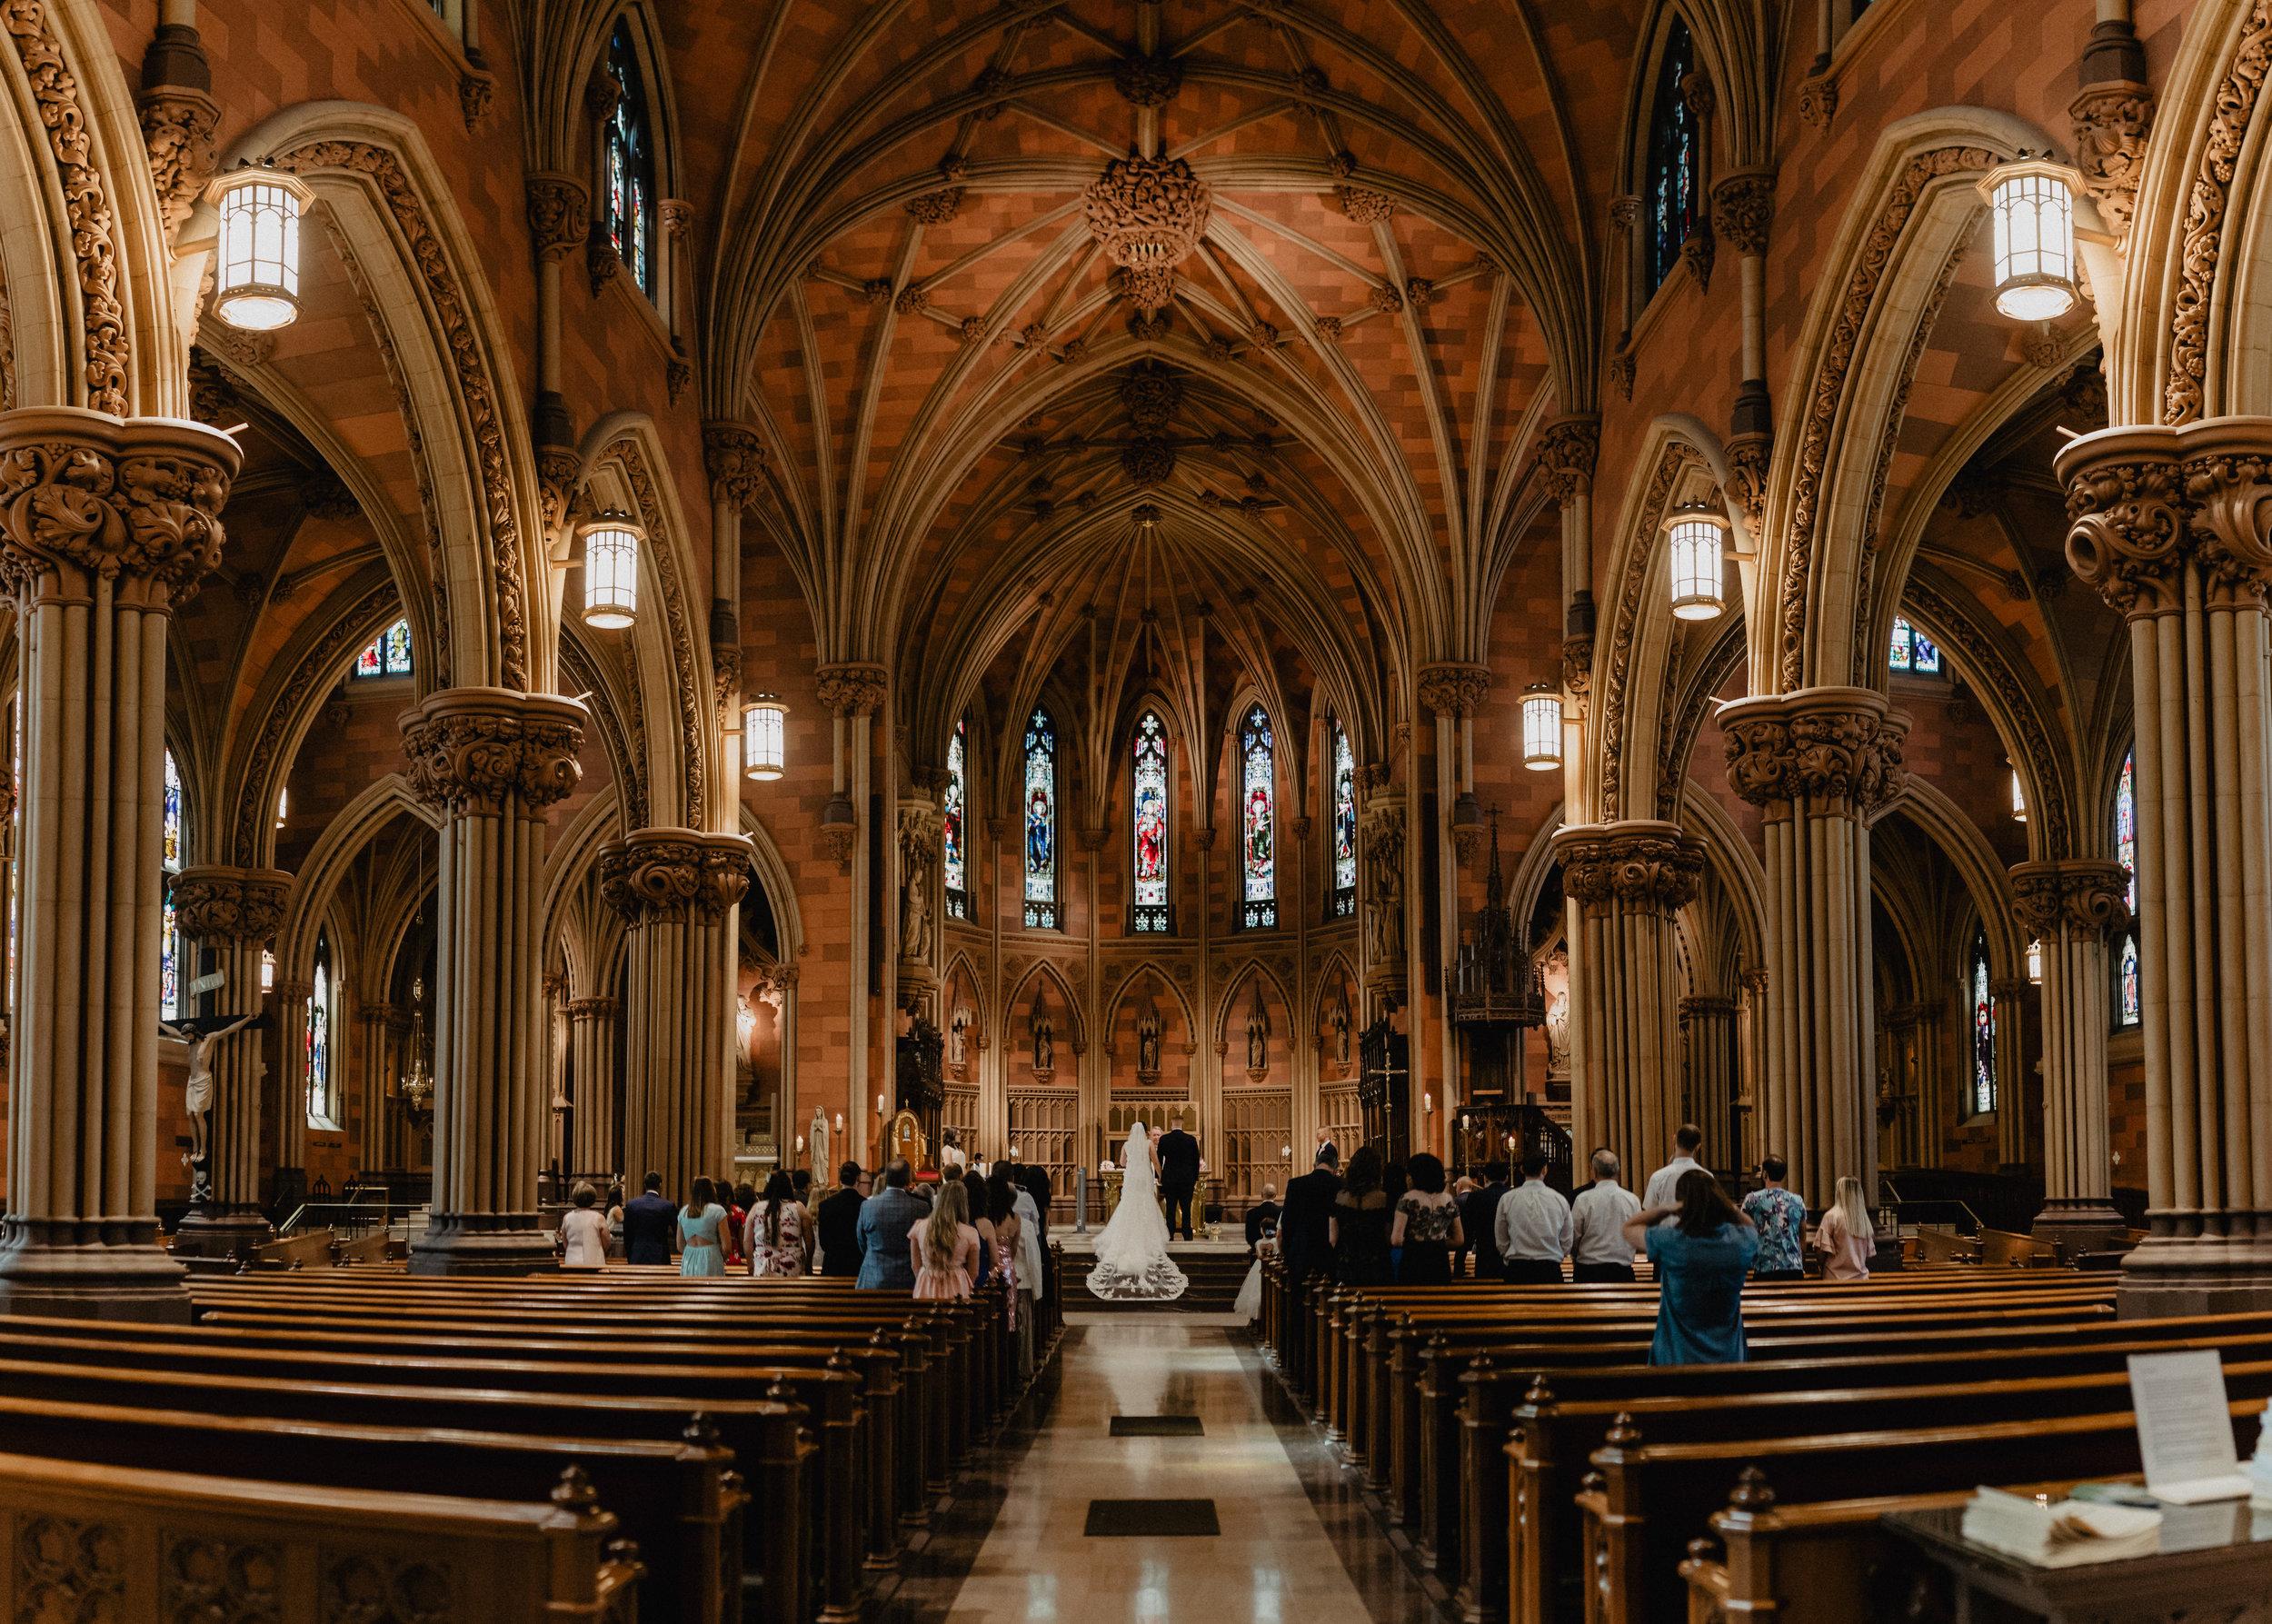 albany-new-york-wedding-23.jpg